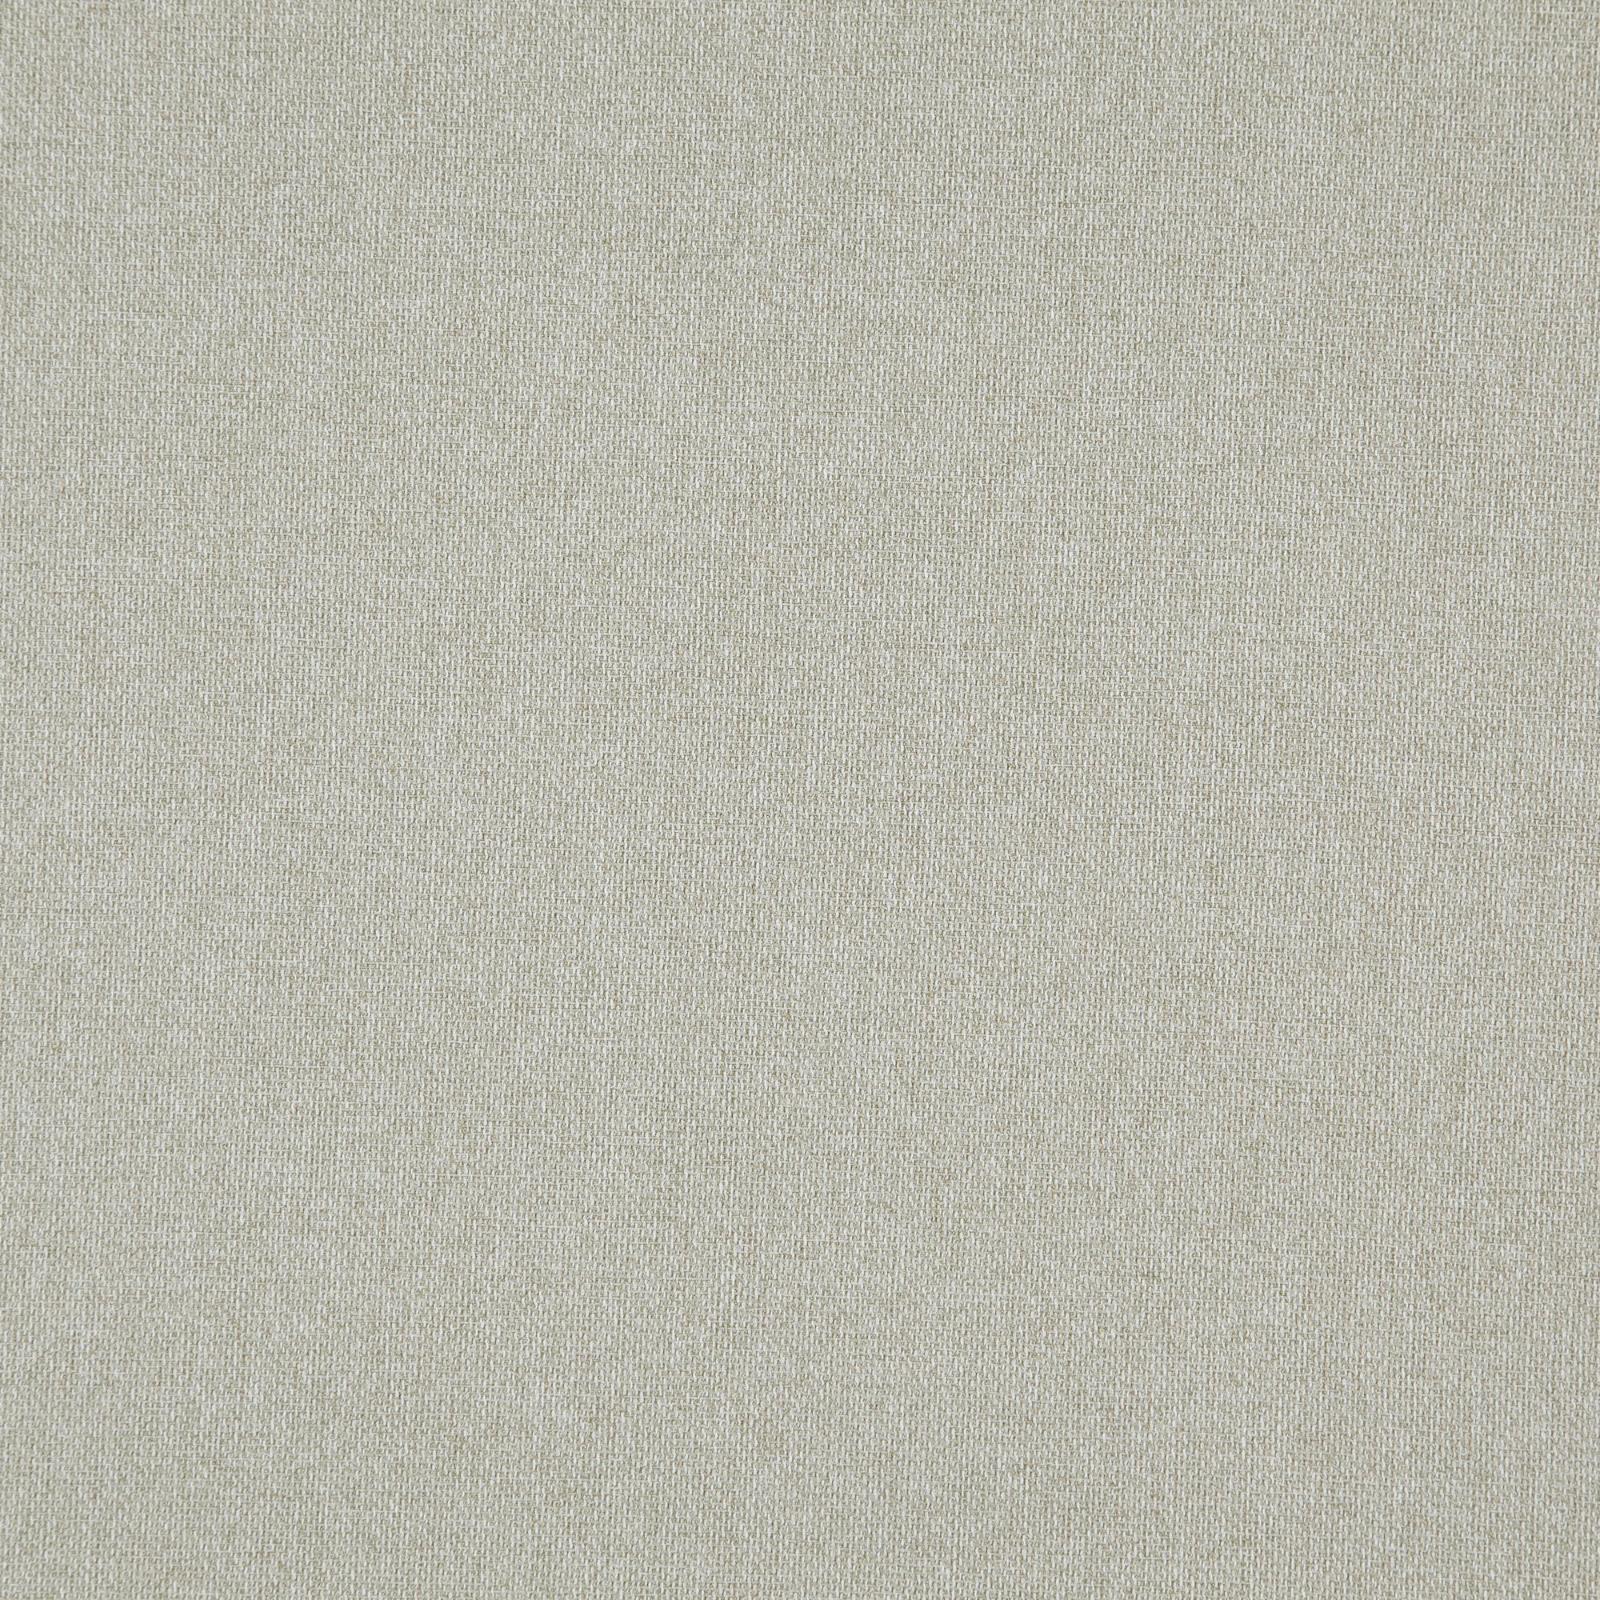 Ampersand Fresco  100% Polyester  Approx. 145cm | Plain  Upholstery 100,000 Rubs  Flame Retardant | Water Repellant